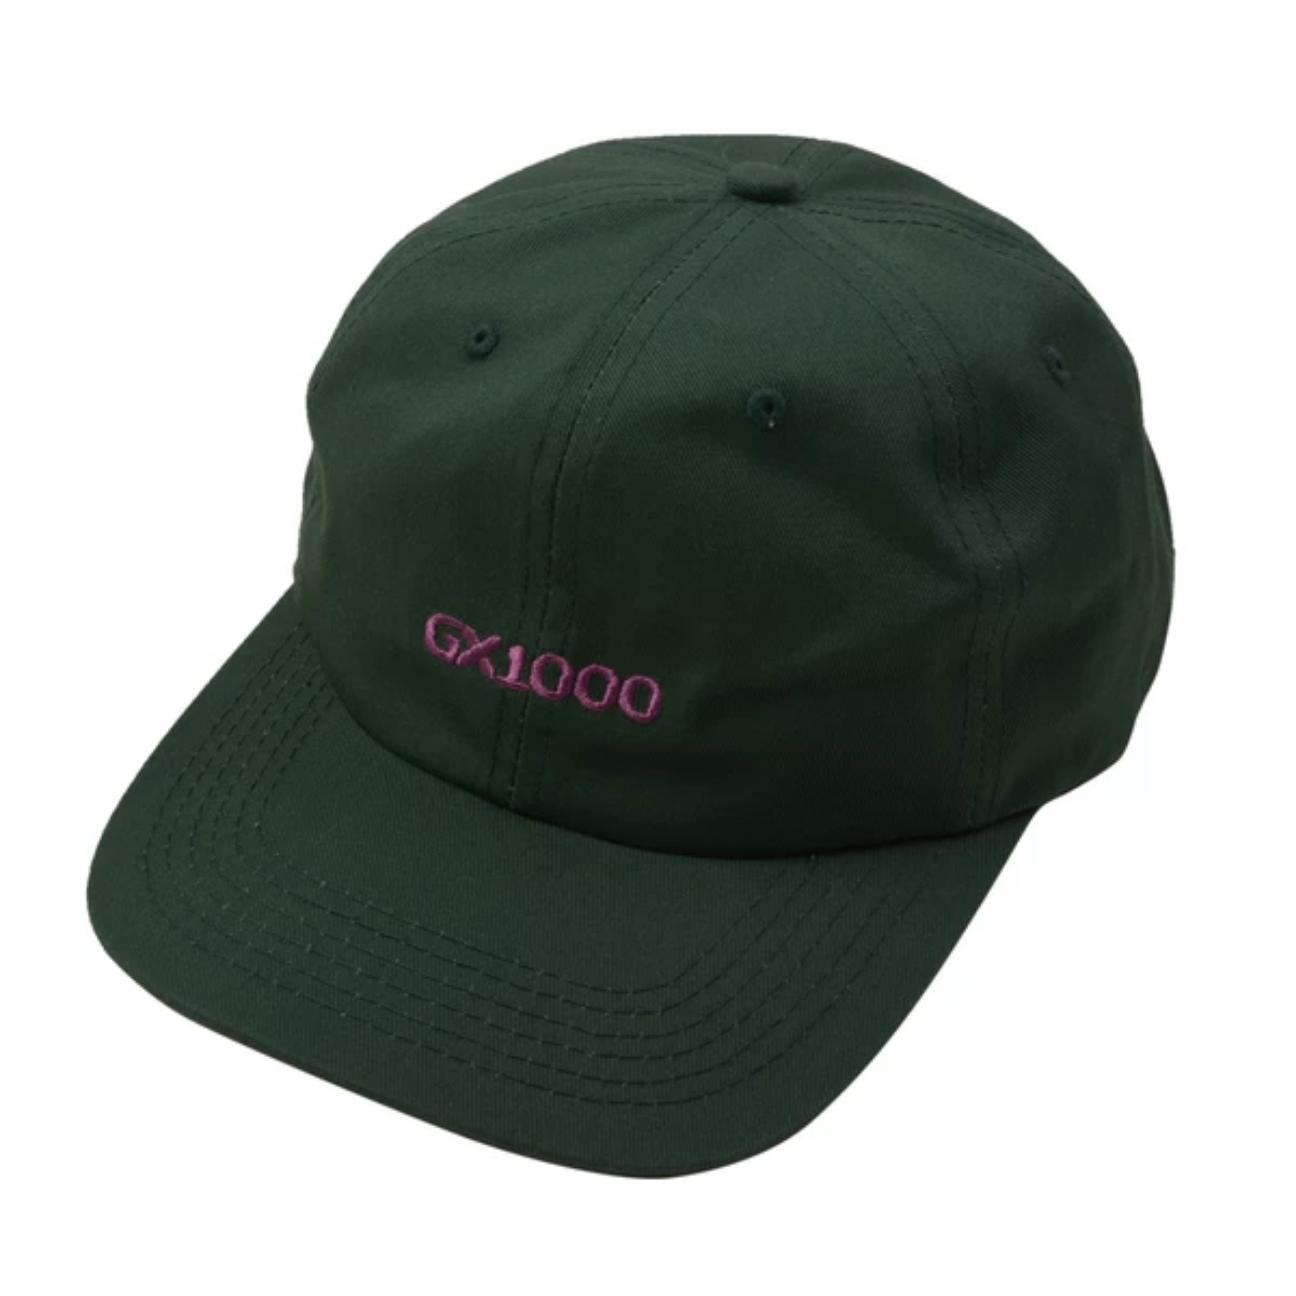 GX1000 GX1000 OG Logo 6 Panel Dark Green